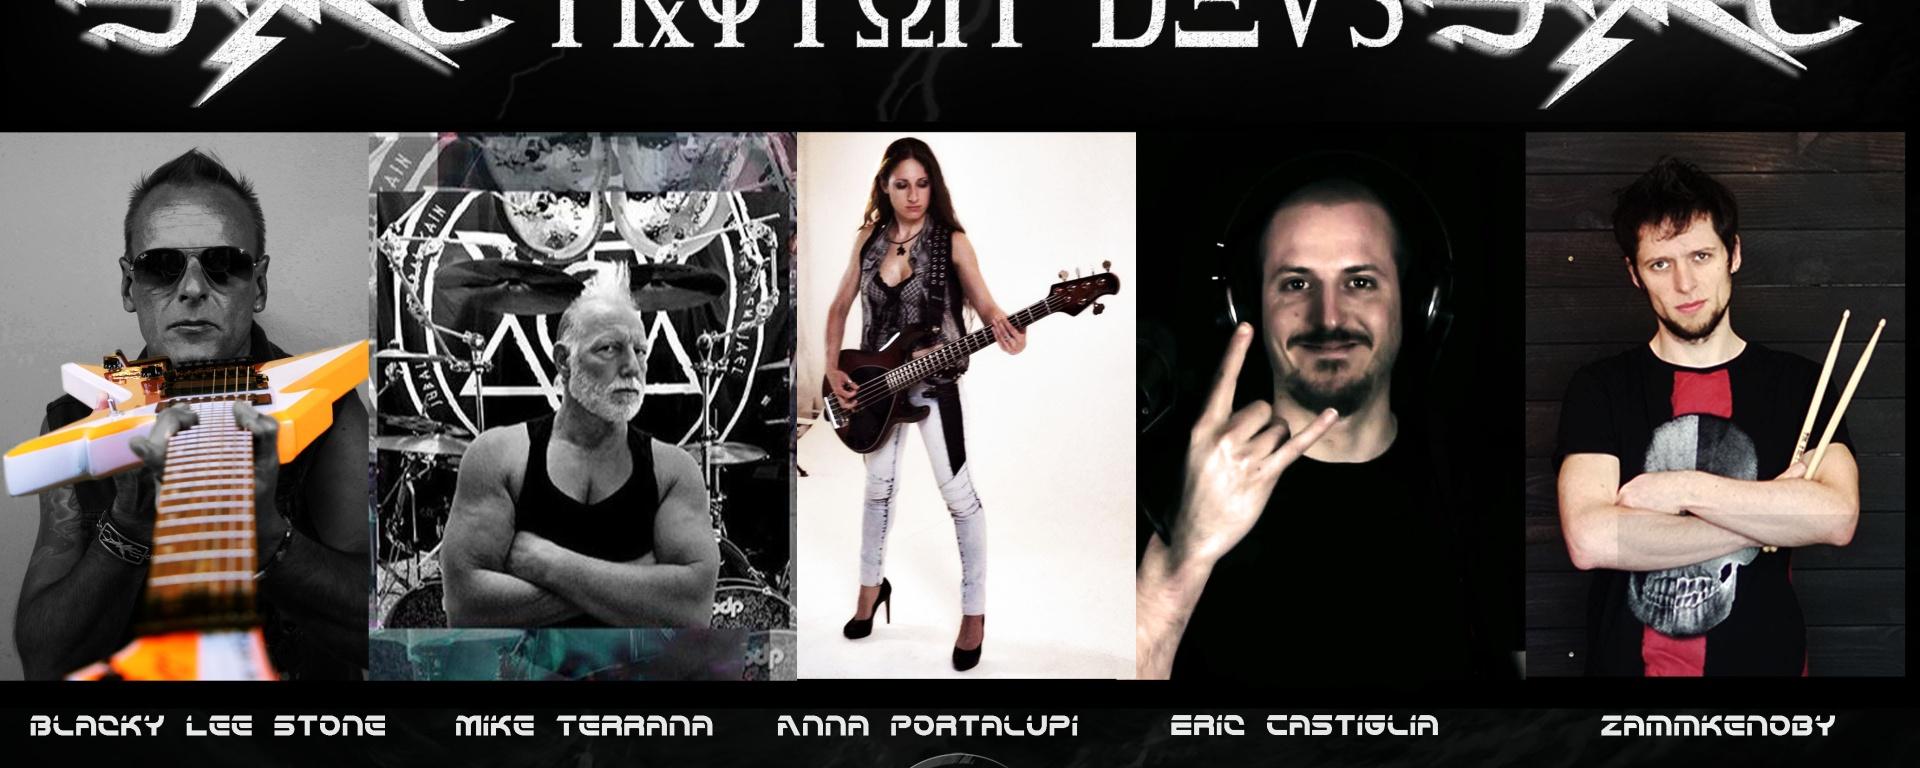 "Rockshots Records: Out Now! TRITON DEVS' New Album ""Stay Alive"""